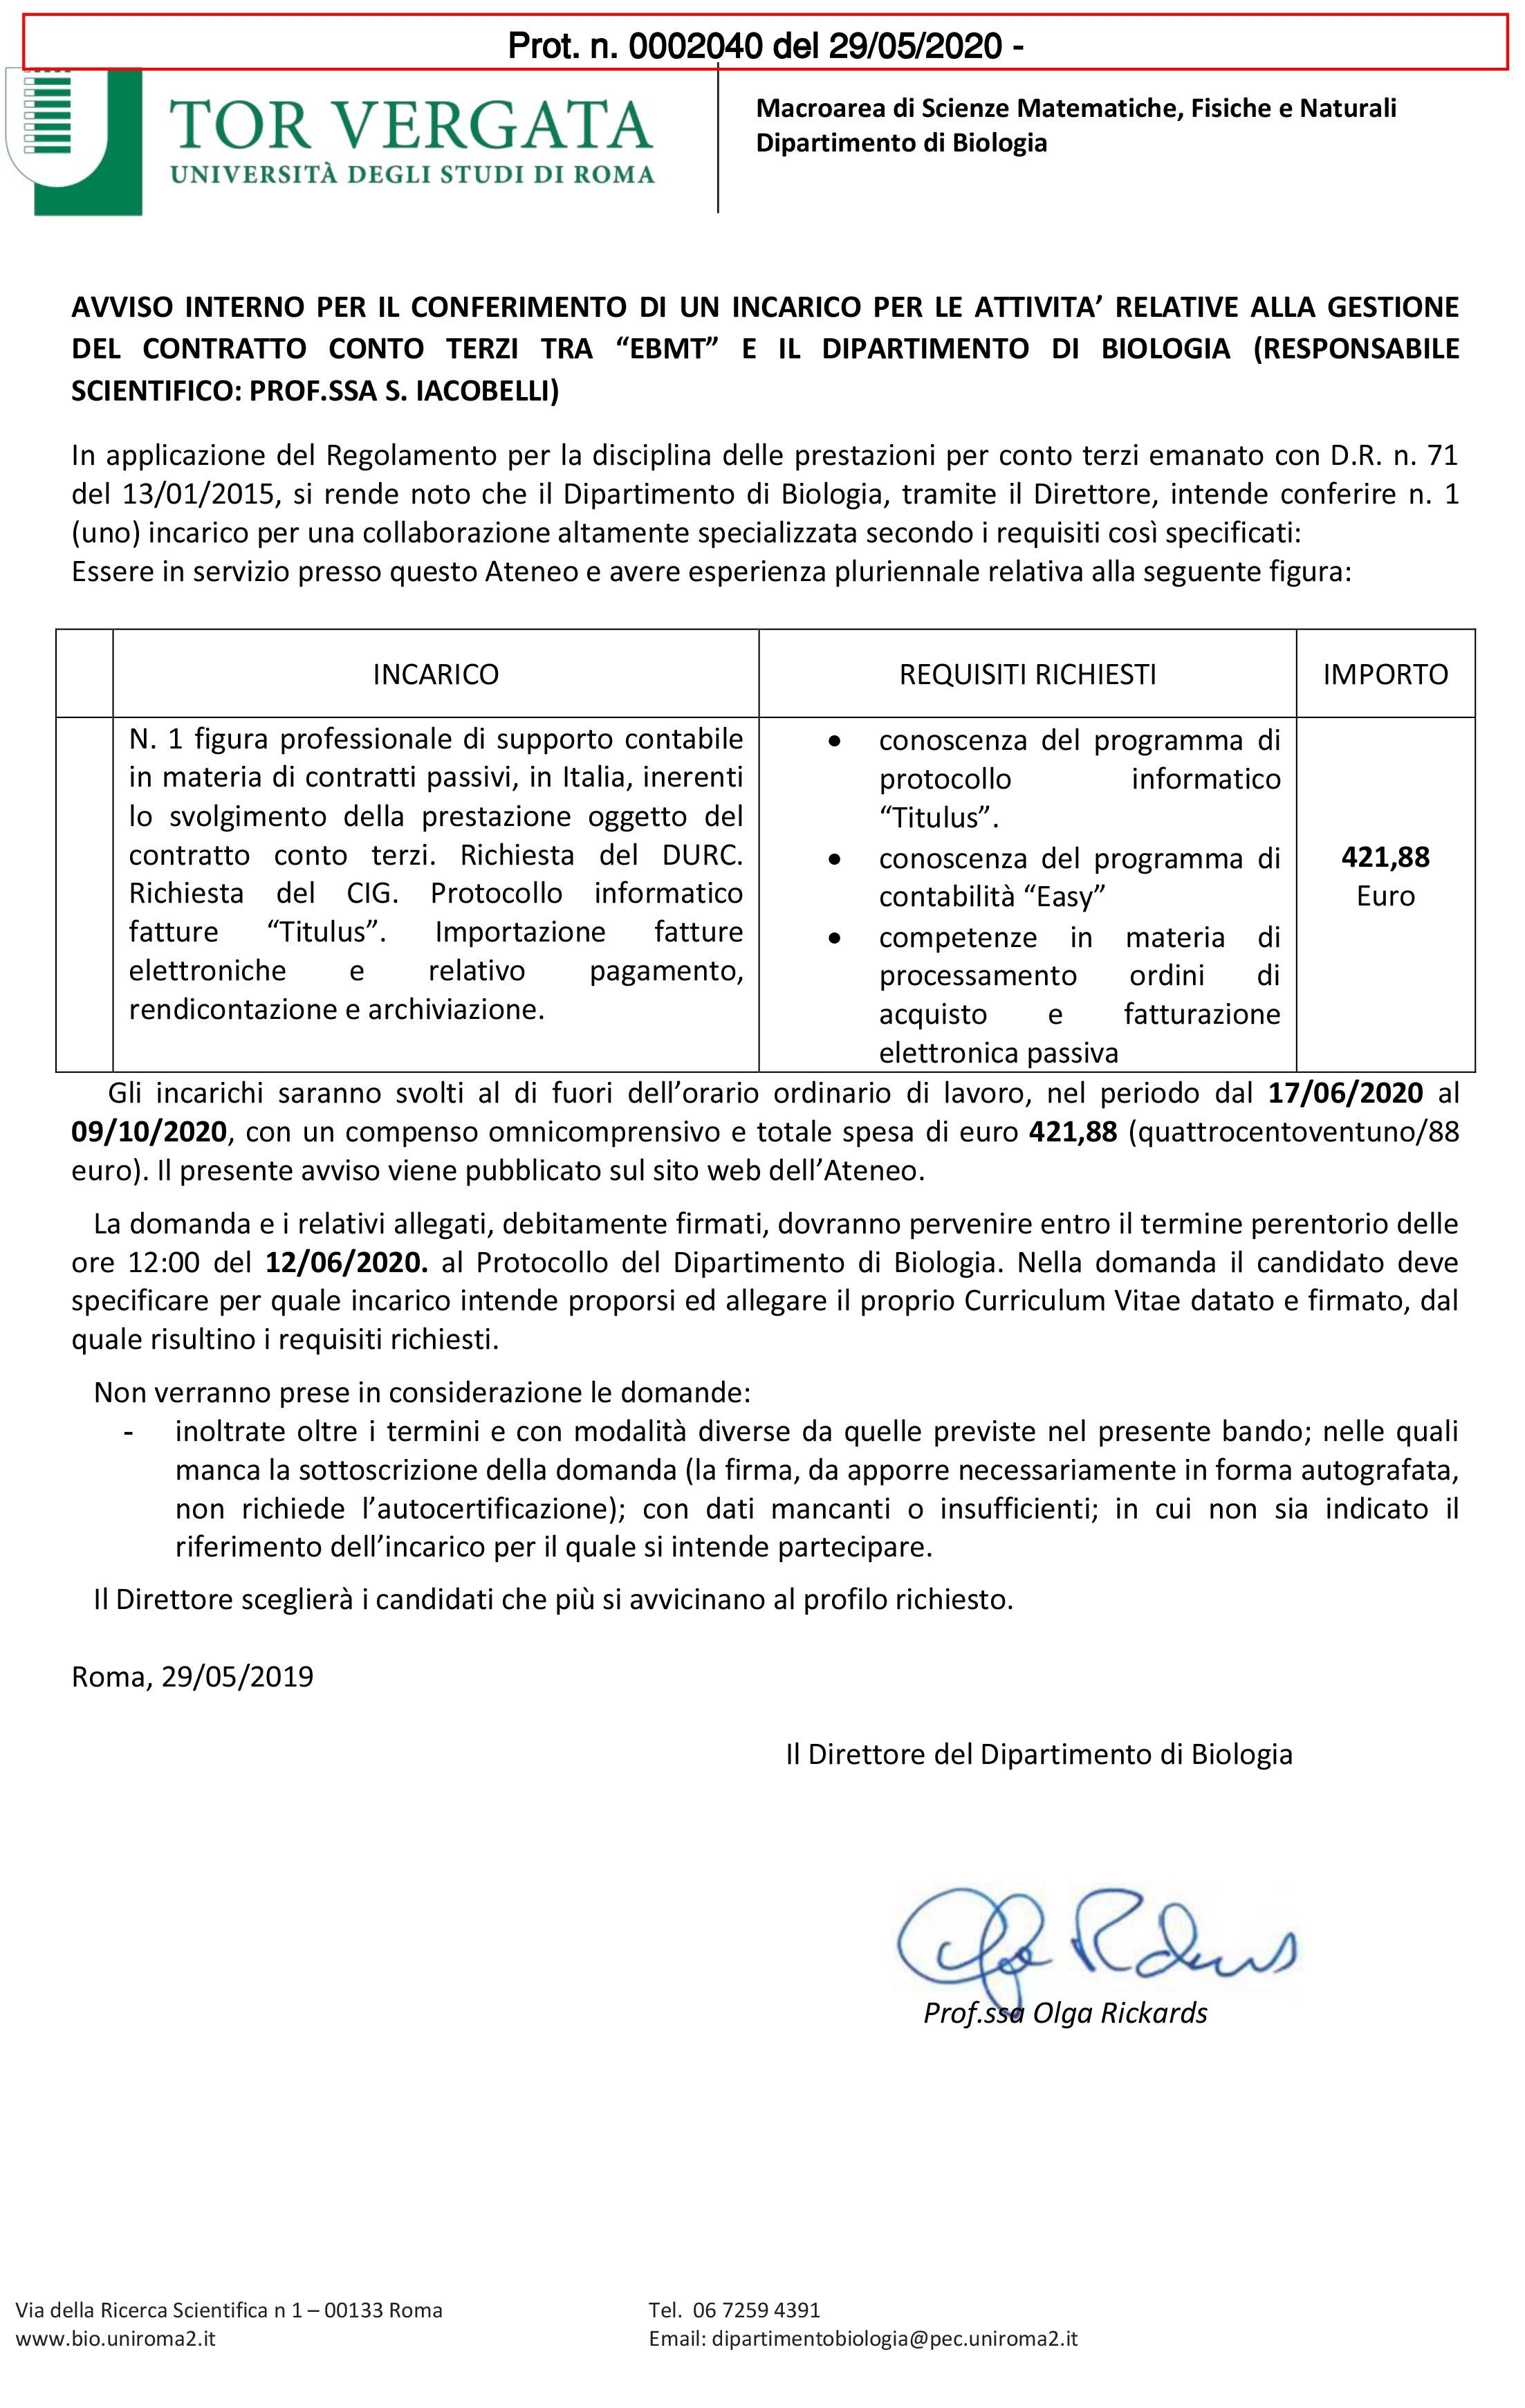 BANDO_EBMT_(42188).pdf